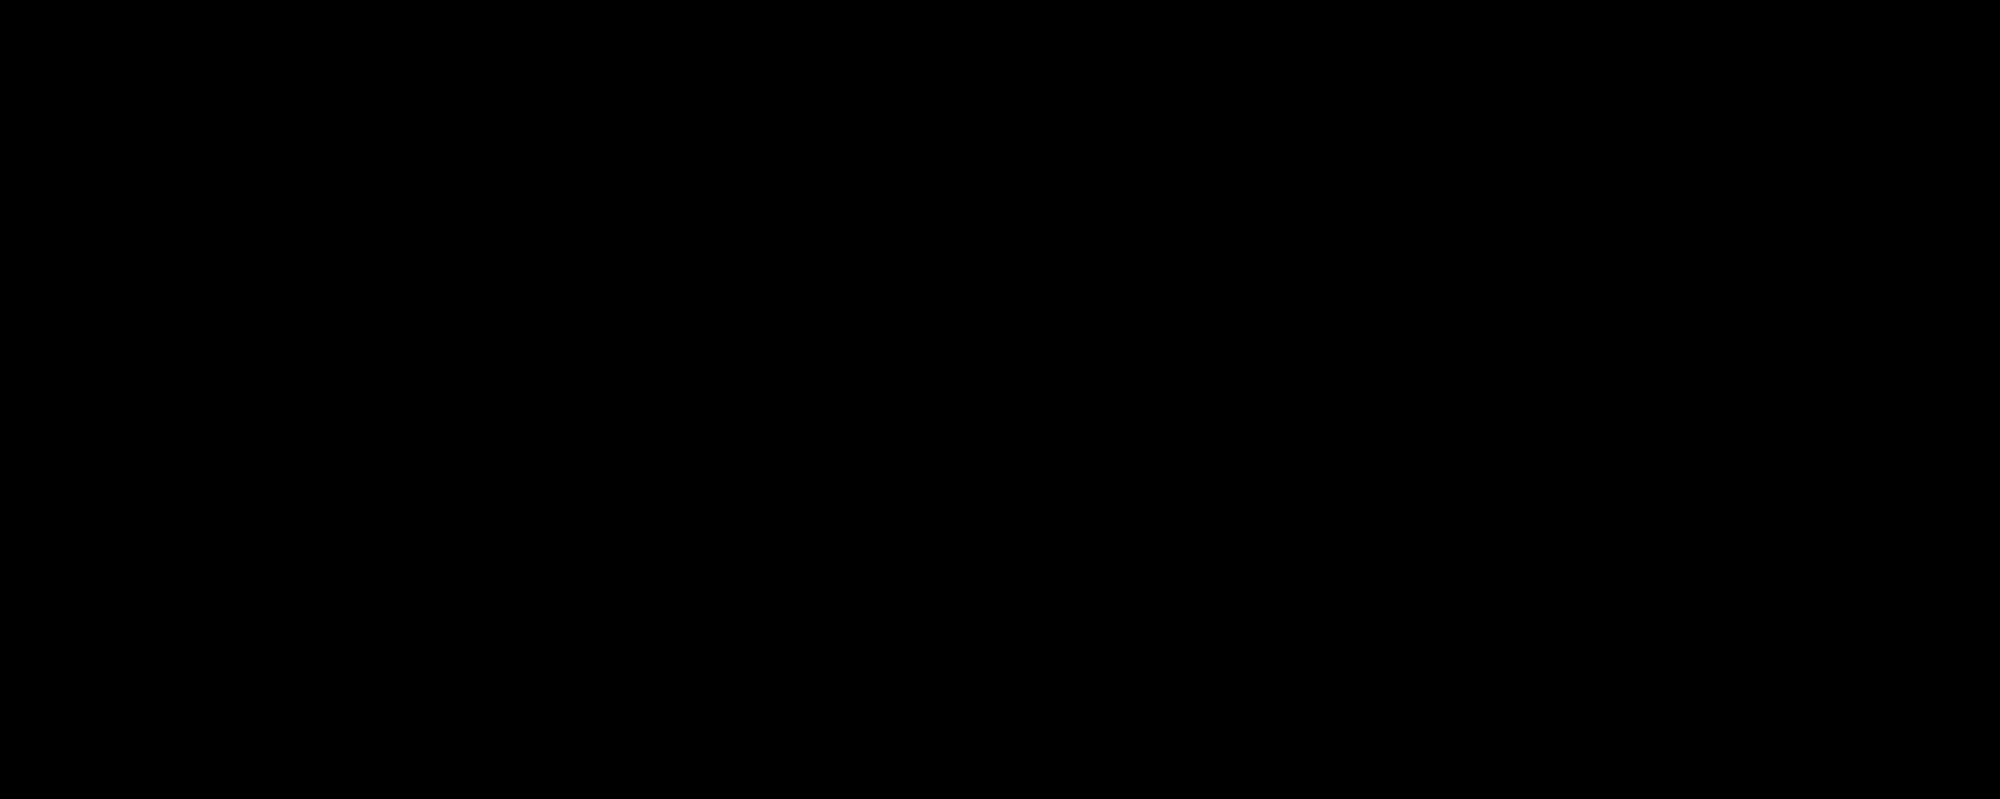 Squarespace Logo Design.png